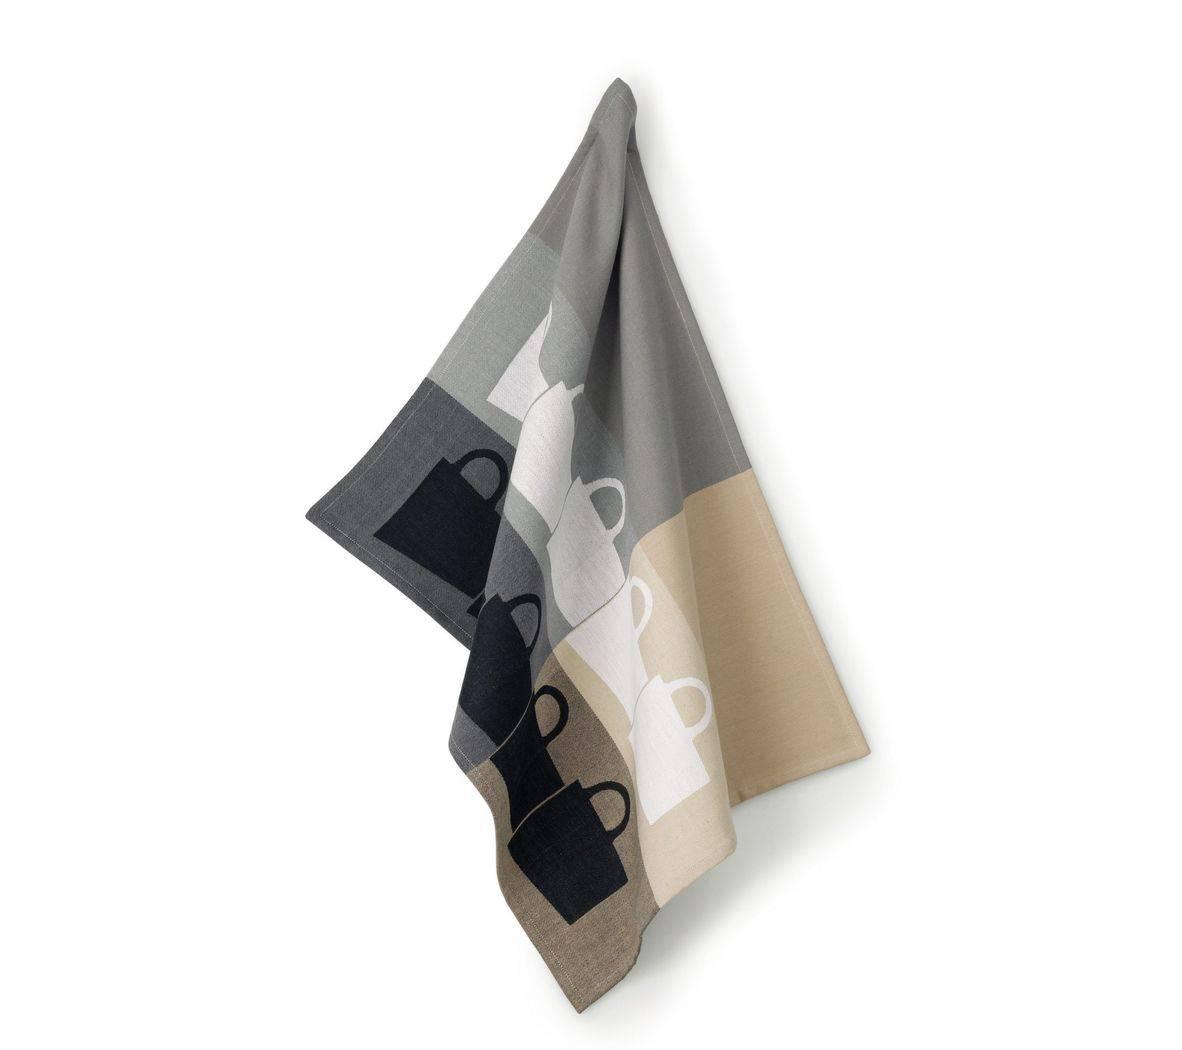 Utěrka na nádobí TABEA 100% bavlna, dekor hrnek, béžová / šedá 50x70cm - Kela